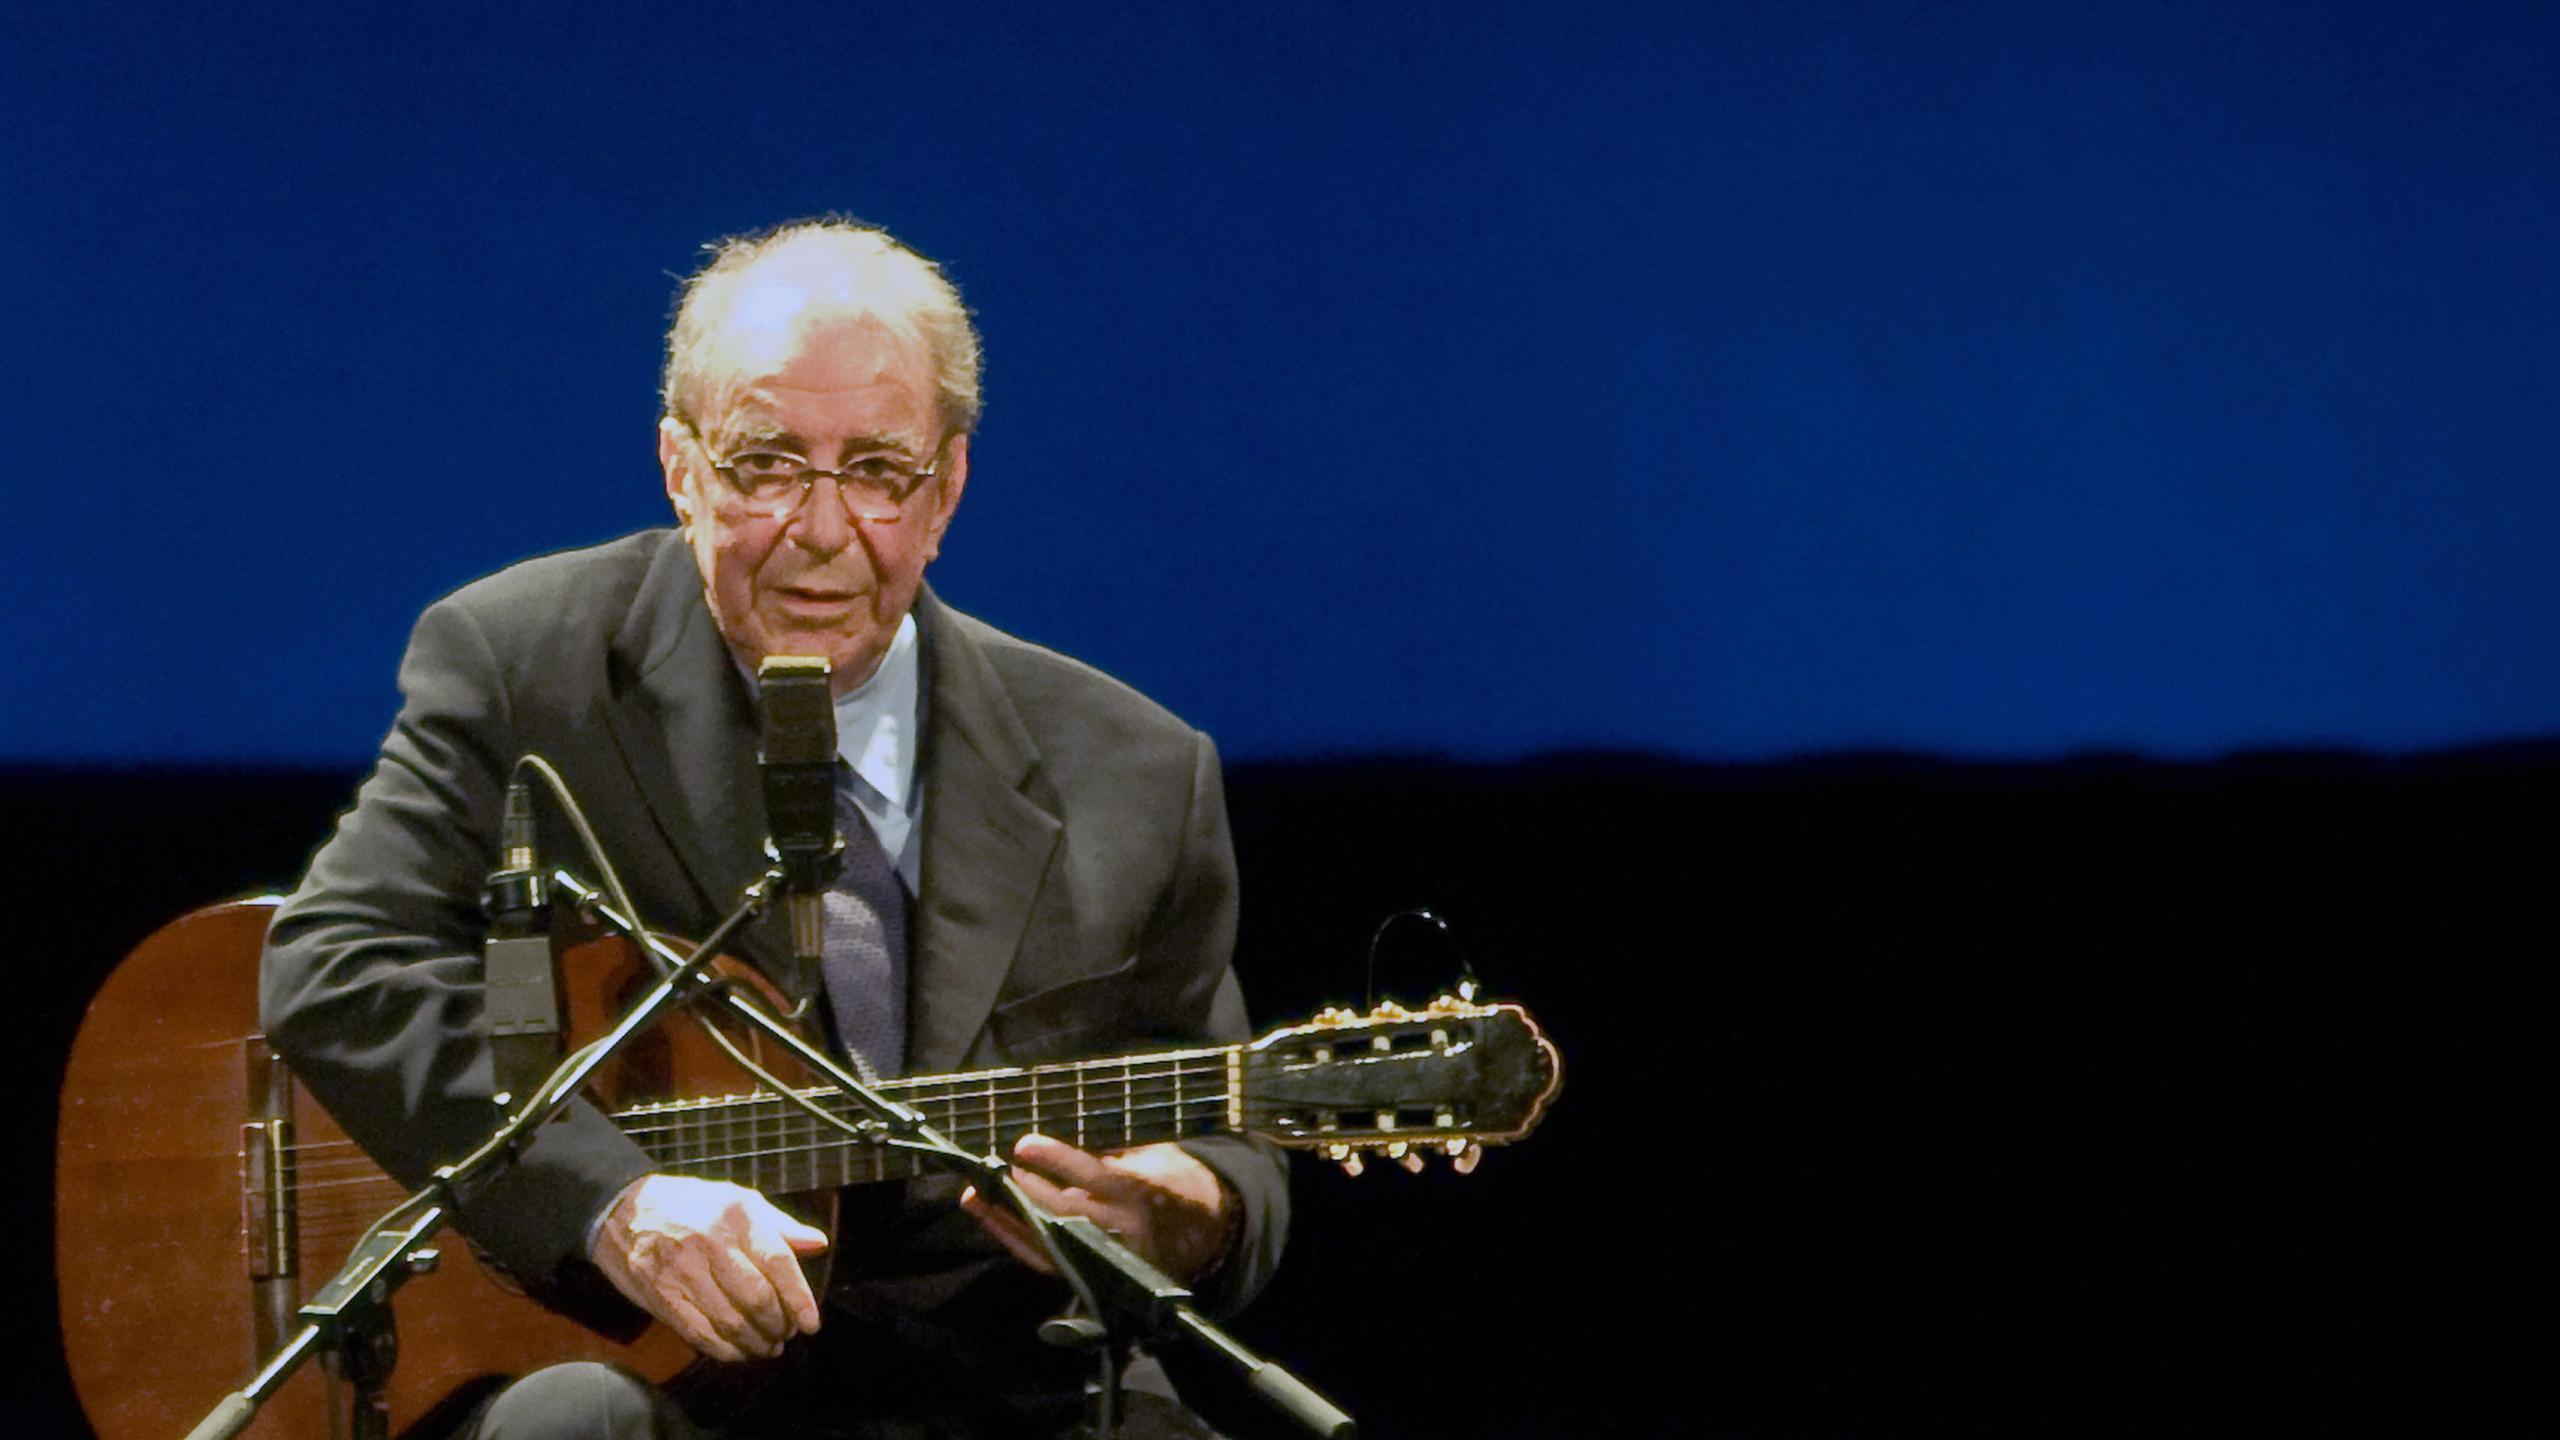 Brazilian musician Joao Gilberto, 77, is seen on Aug. 24, 2008, at the Teatro Municipal in Rio de Janeiro. (Credit: Ari Versiani/AFP/Getty Images)